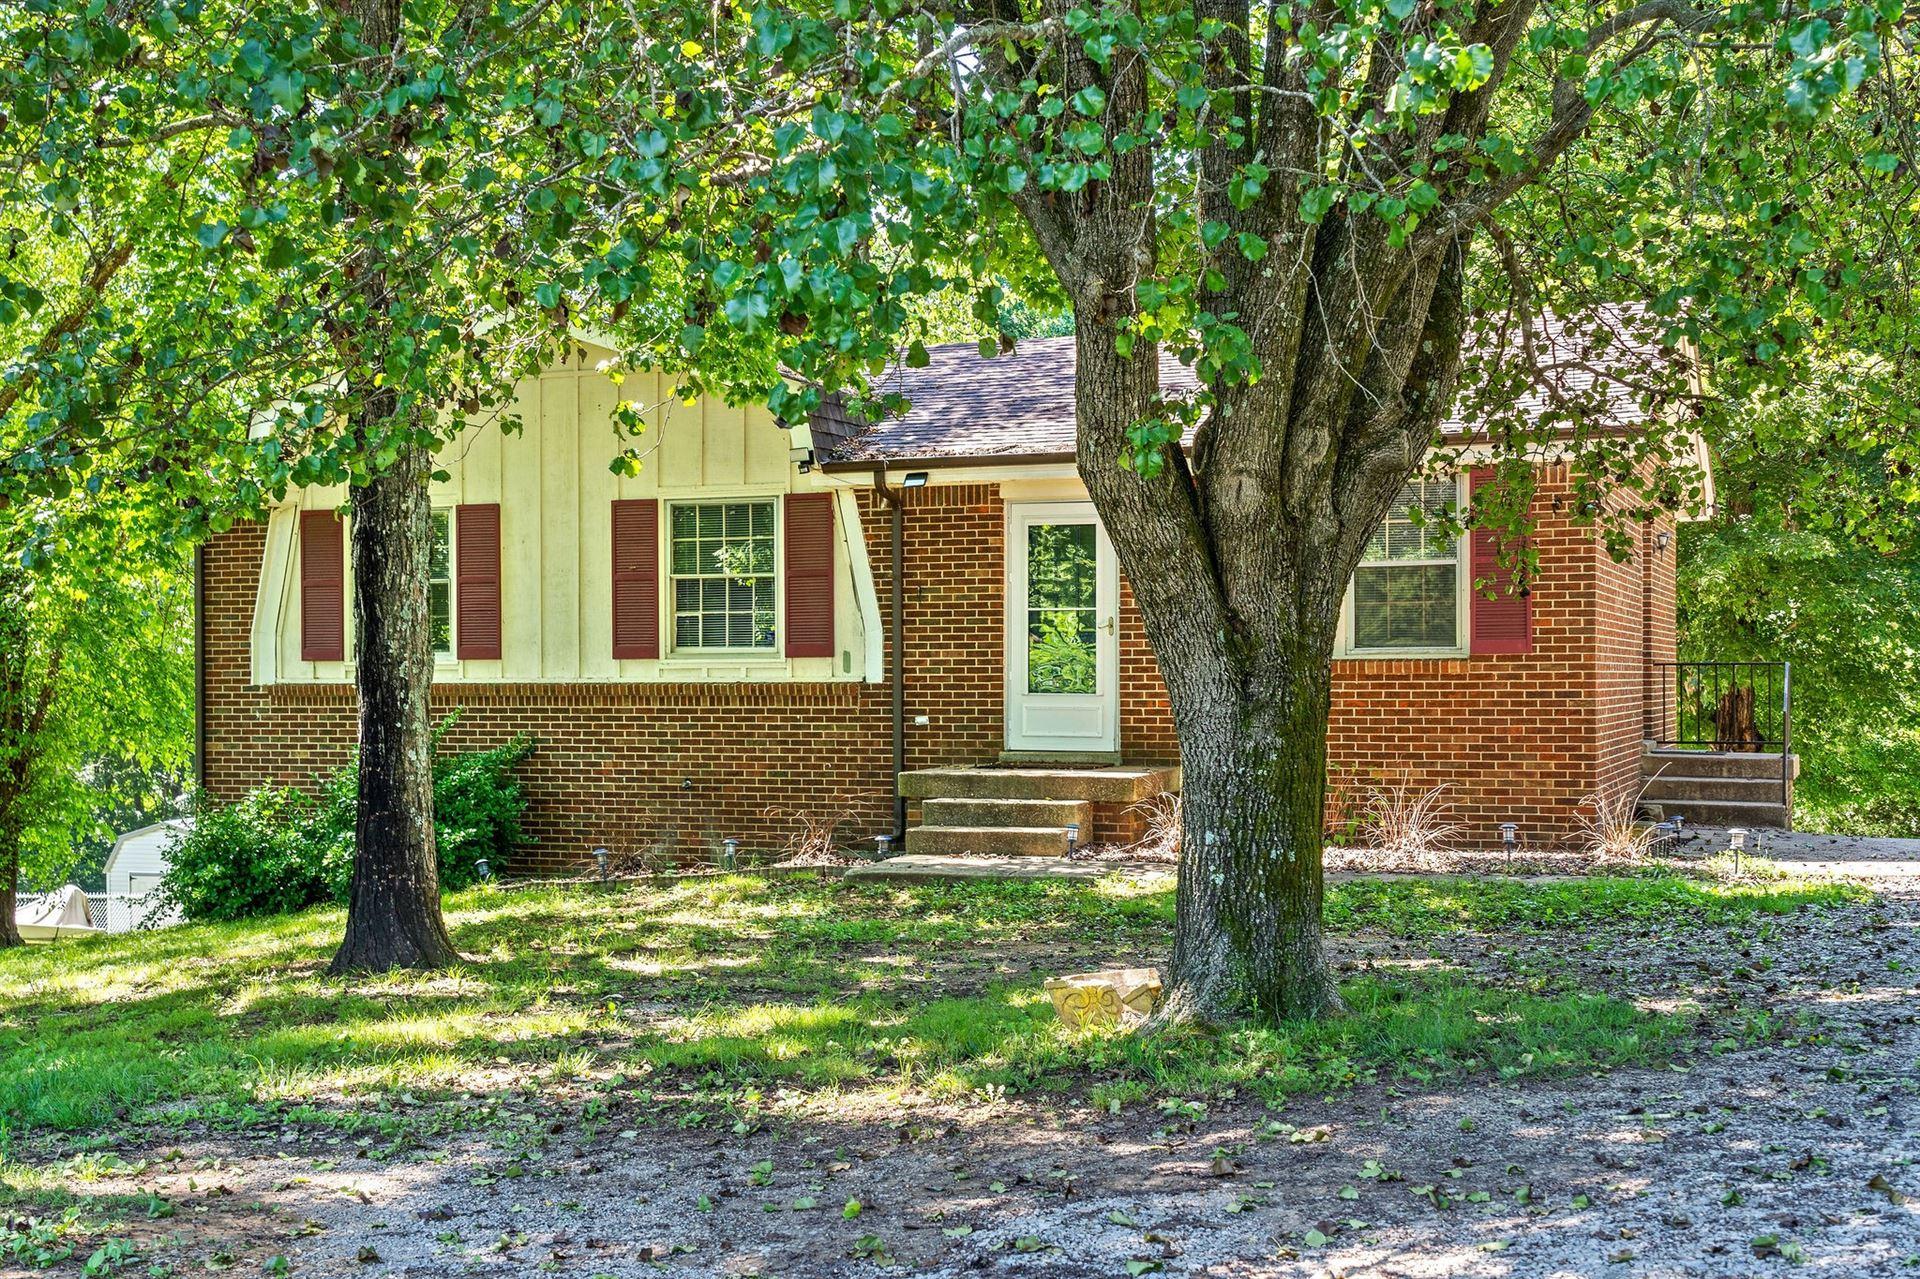 Photo of 1024 Gratton Rd, Clarksville, TN 37043 (MLS # 2262265)